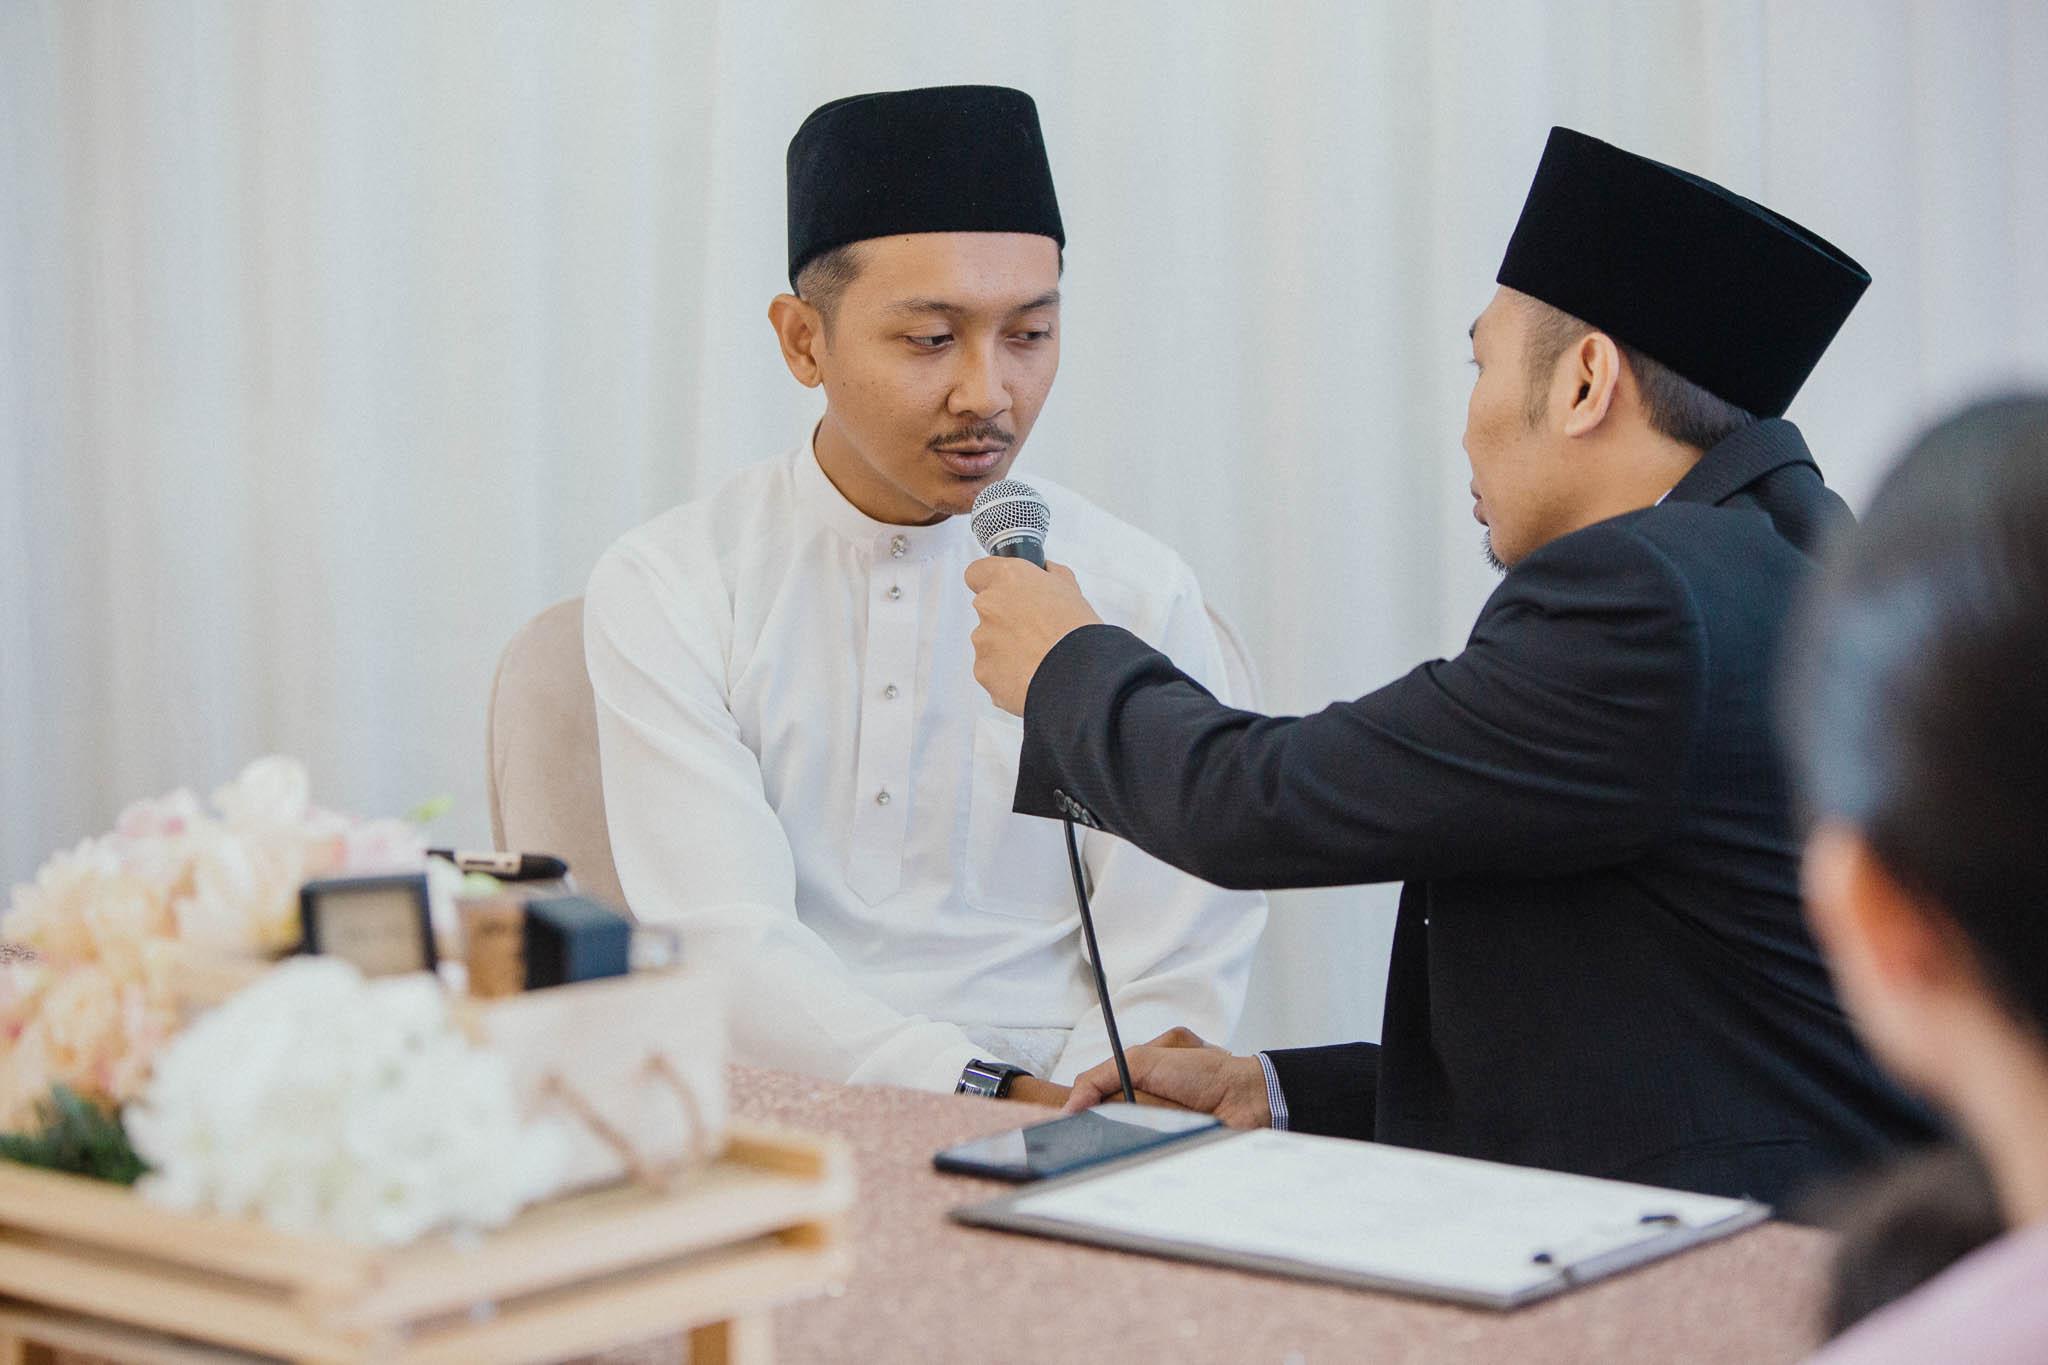 singapore-wedding-photographer-wedding-nufail-addafiq-018.jpg